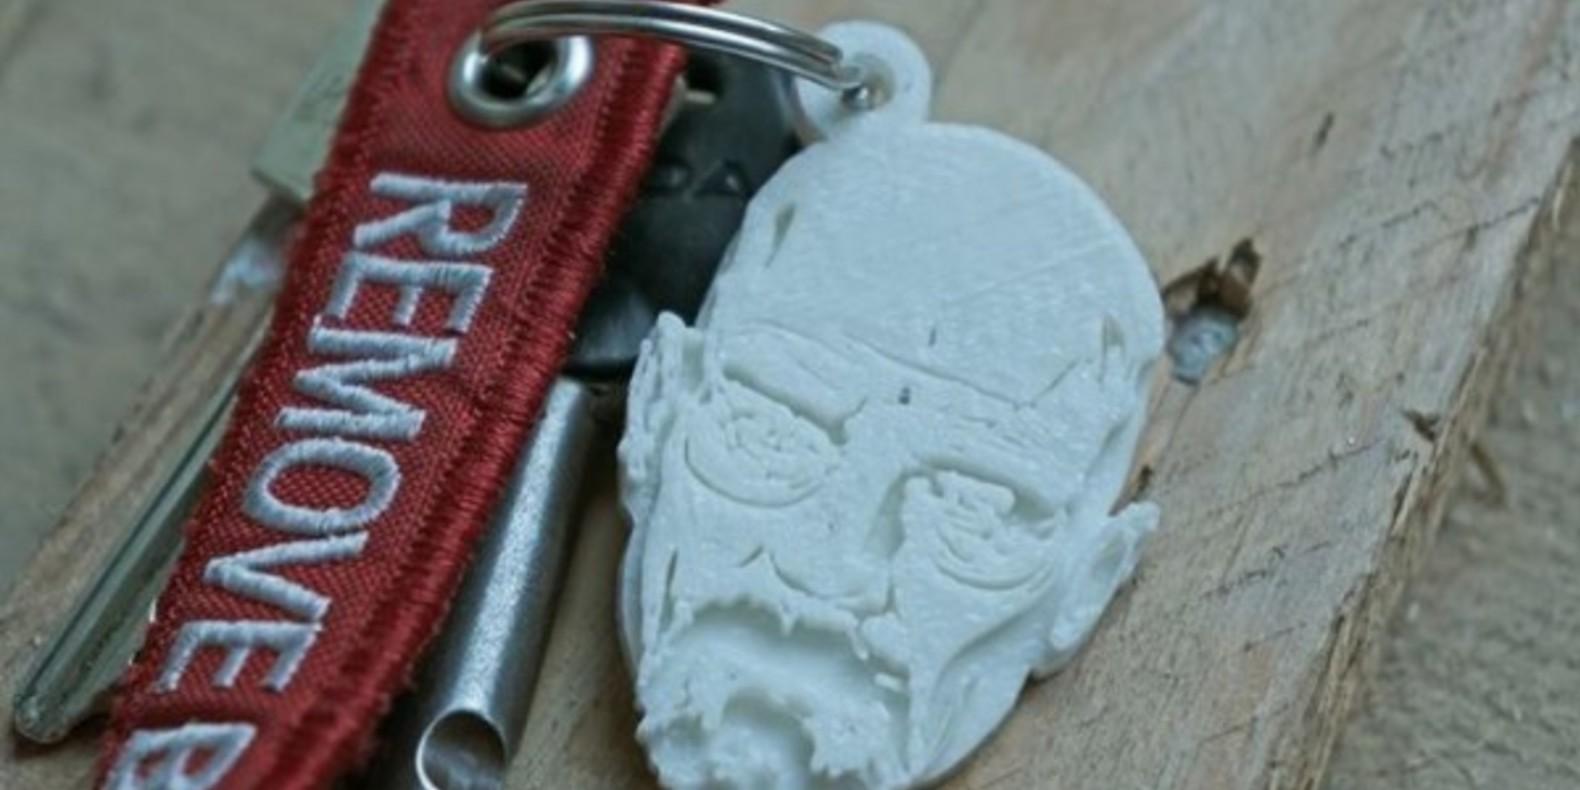 walter white breaking bad fichier 3D cults cults3D impression 3D 3D printing porte clé amc 1